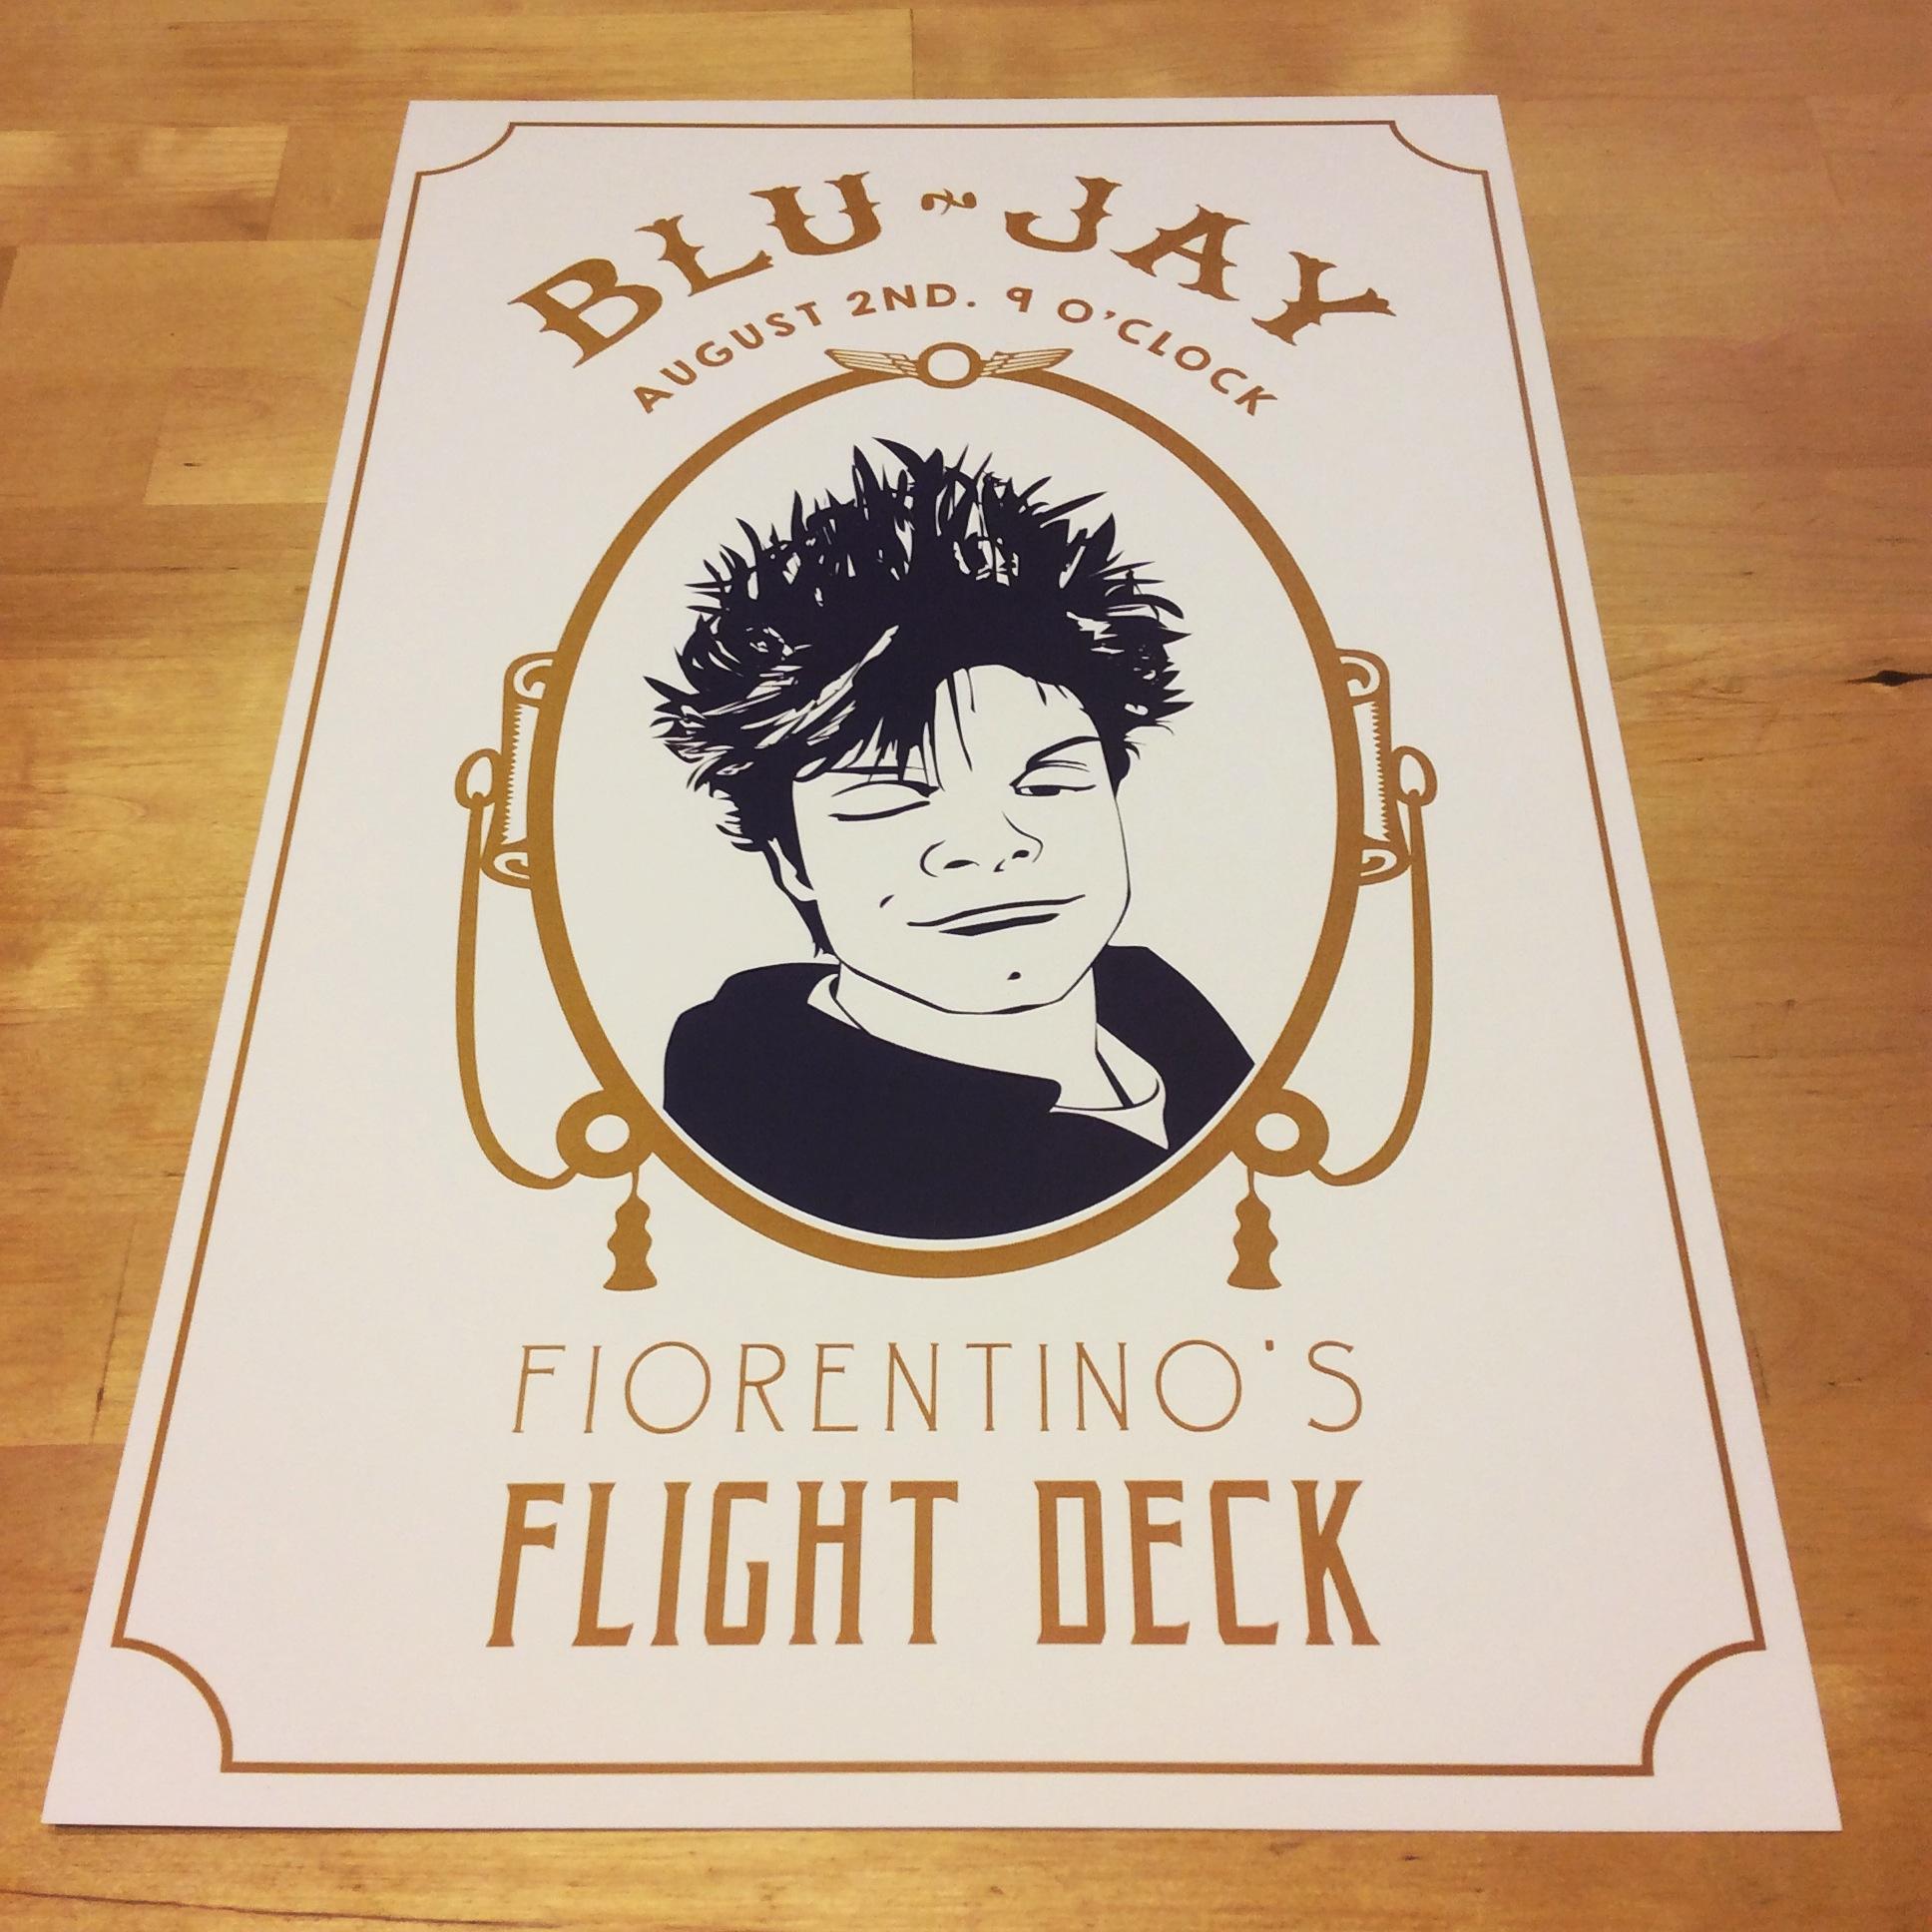 BLUJAY AUGUST 2ND 9 O'CLOCK FIORENTINO'S FLIGHT DECK